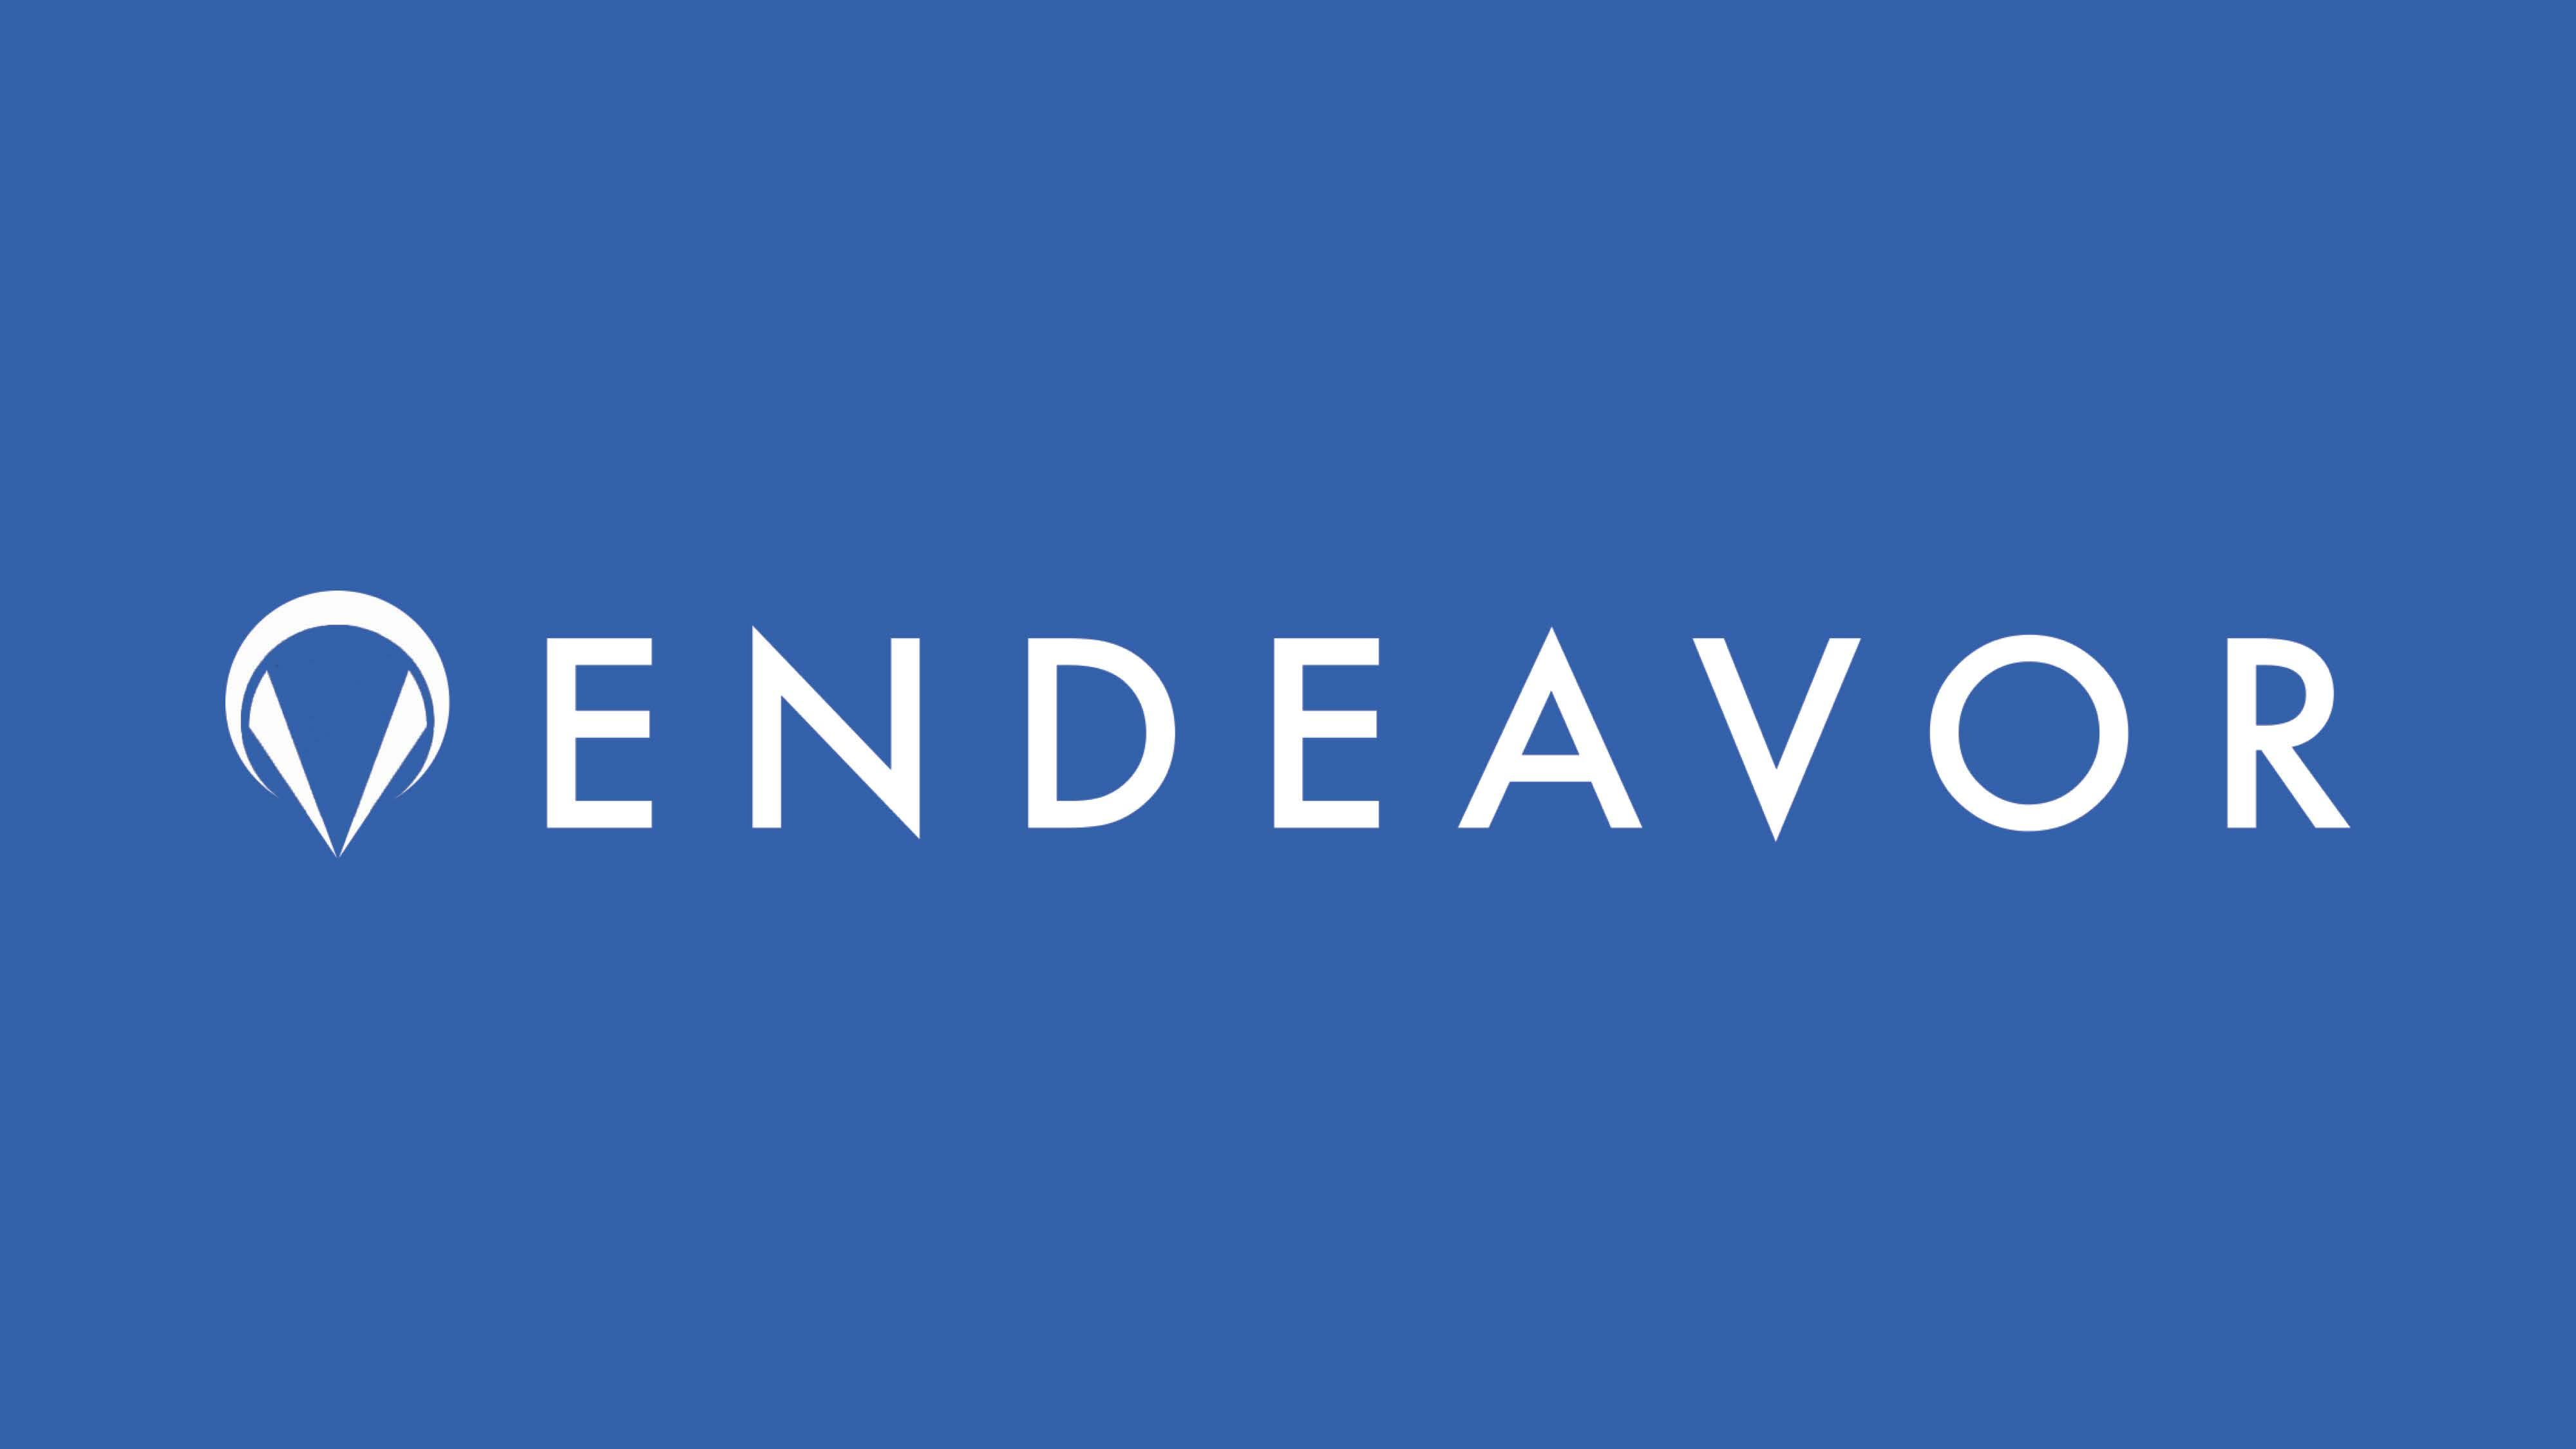 endeavor_21.jpg